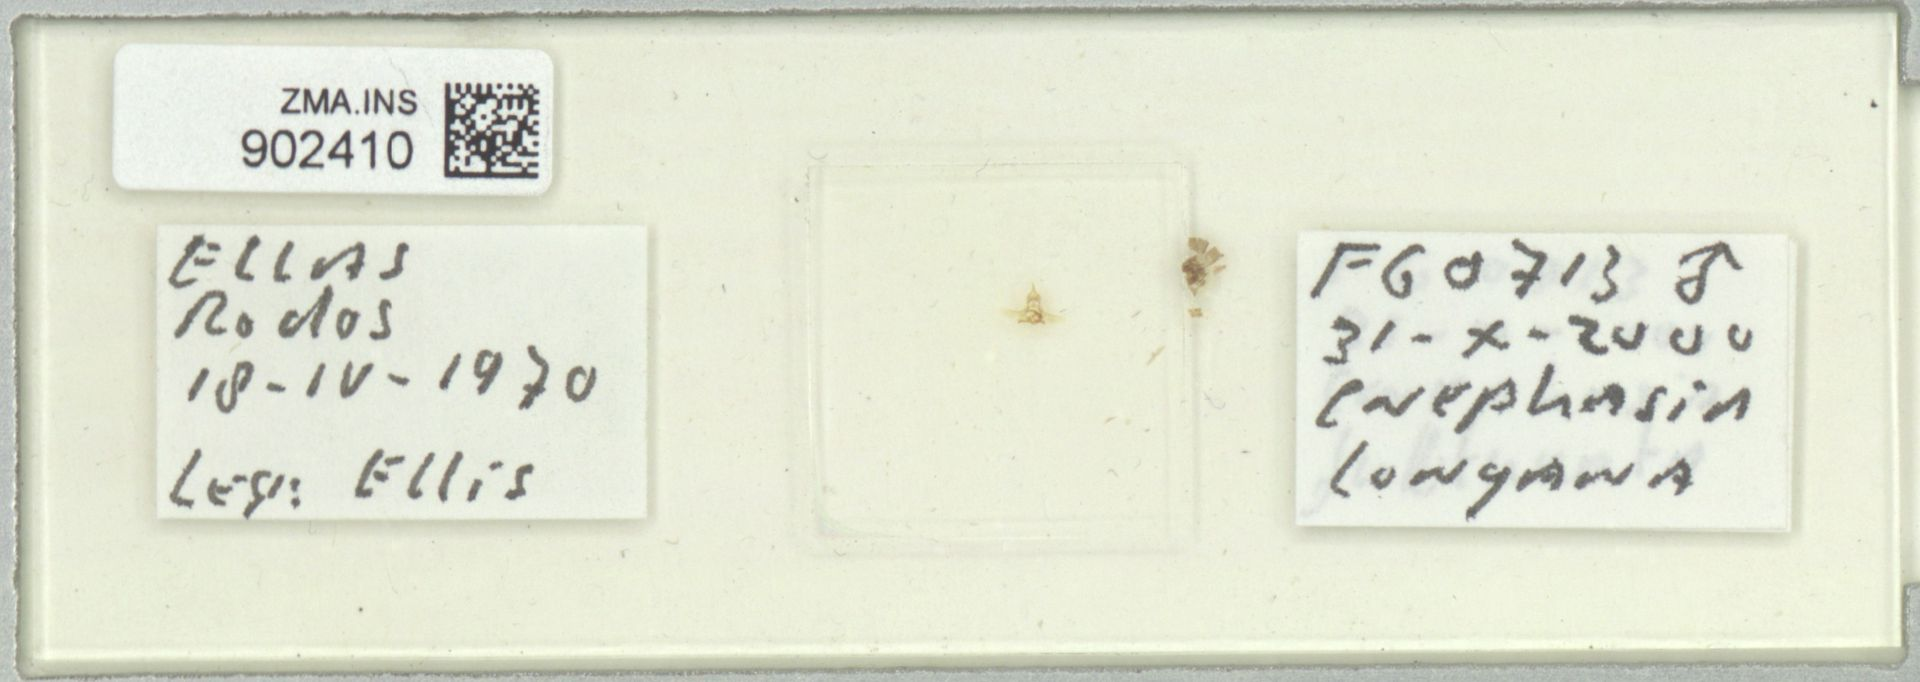 ZMA.INS.902410   Cnephasia longana